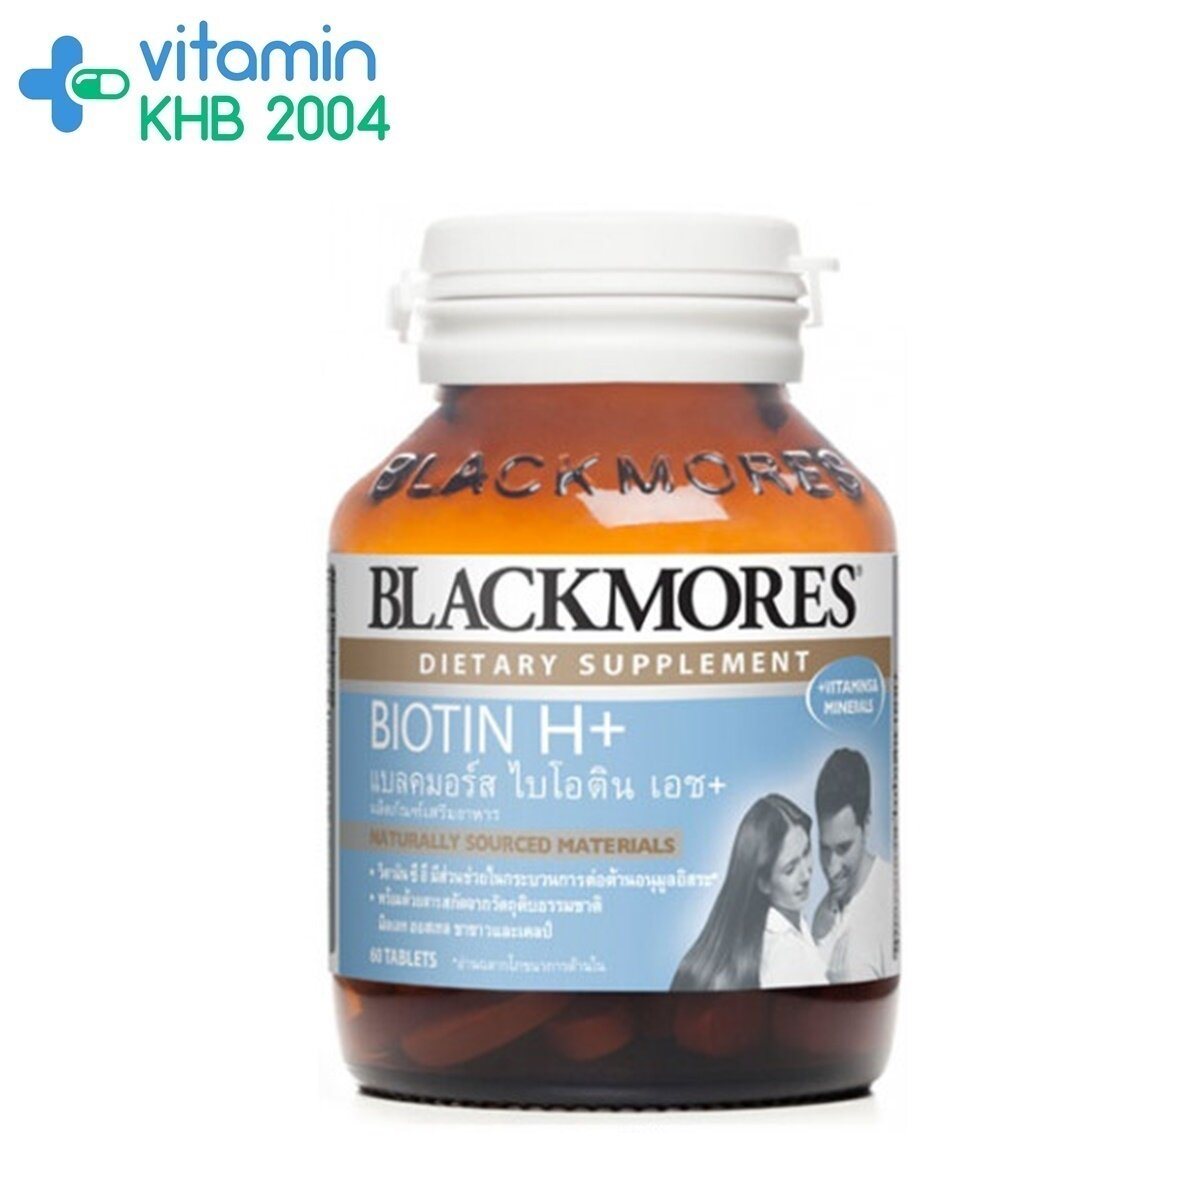 Blackmores Biotin H+ 60's แบลคมอร์ส ไบโอติน เอช+ ขนาด (60เม็ด)